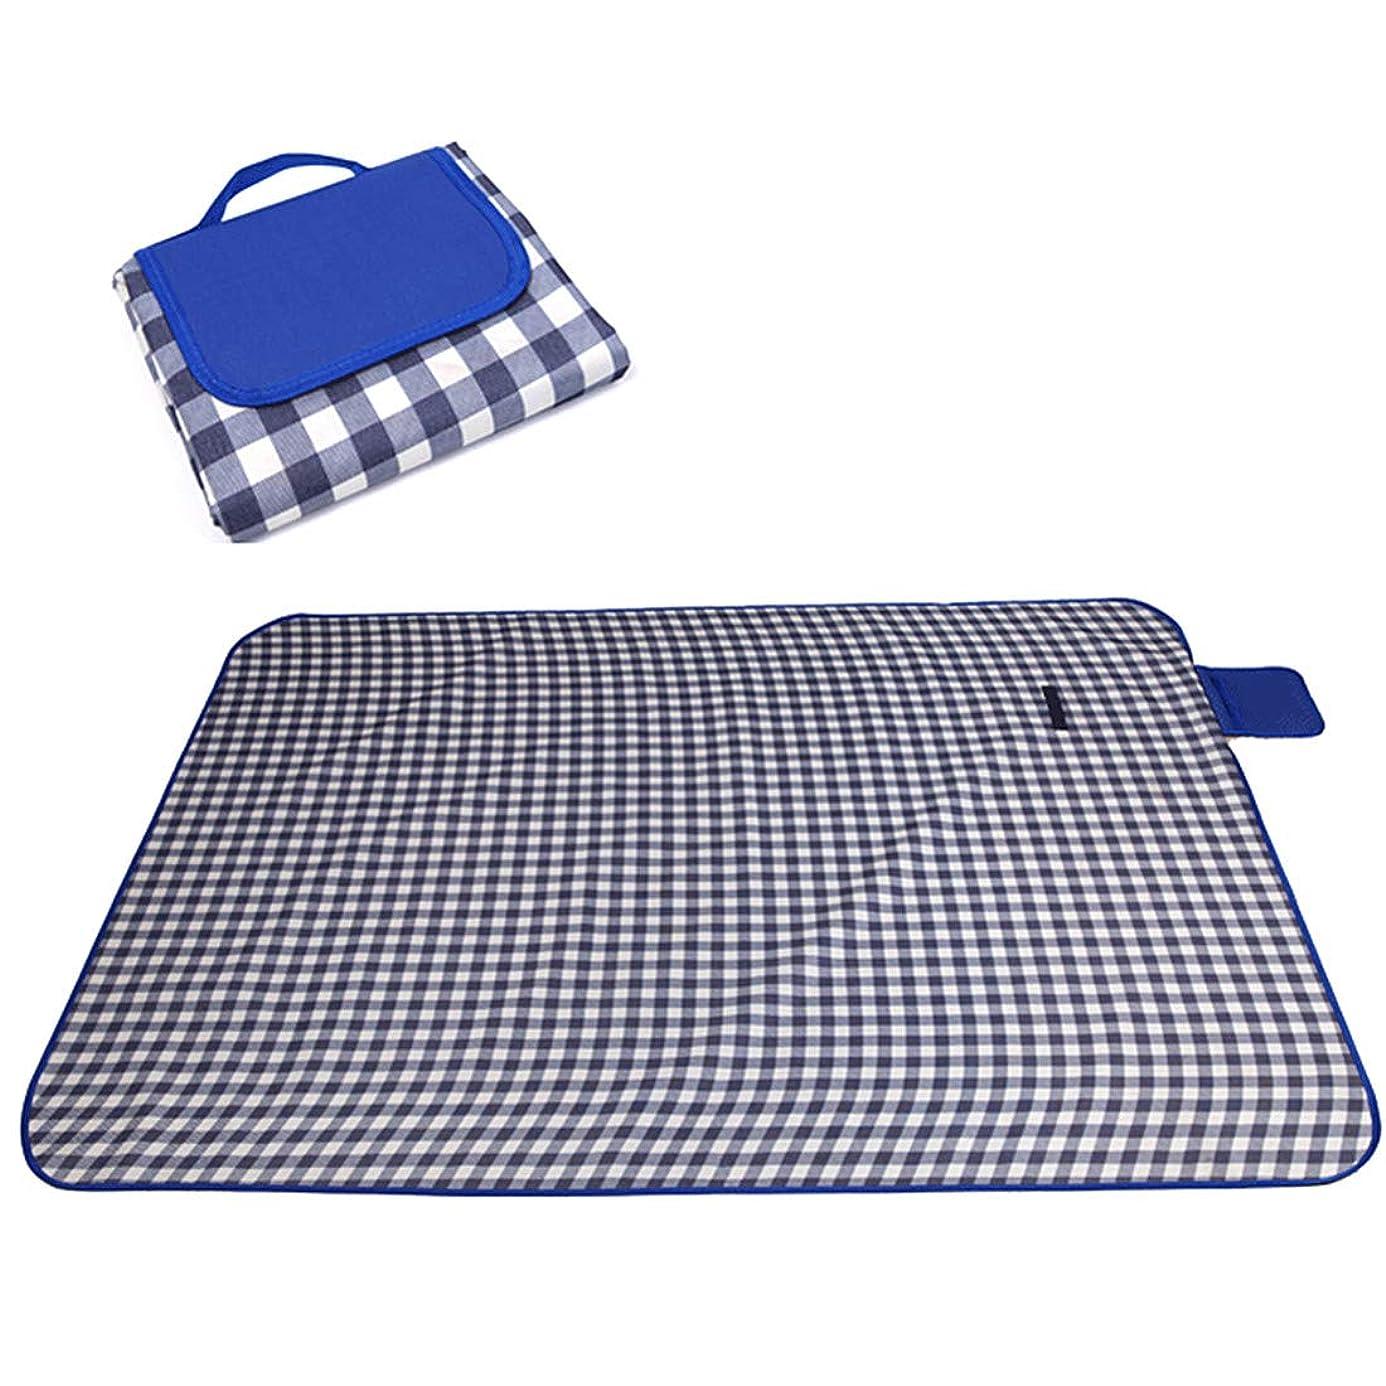 ZDTXKJ Outdoor Picnic Blanket Water-Resistant Beach Blanket Tent mat Widened Picnic Cloth